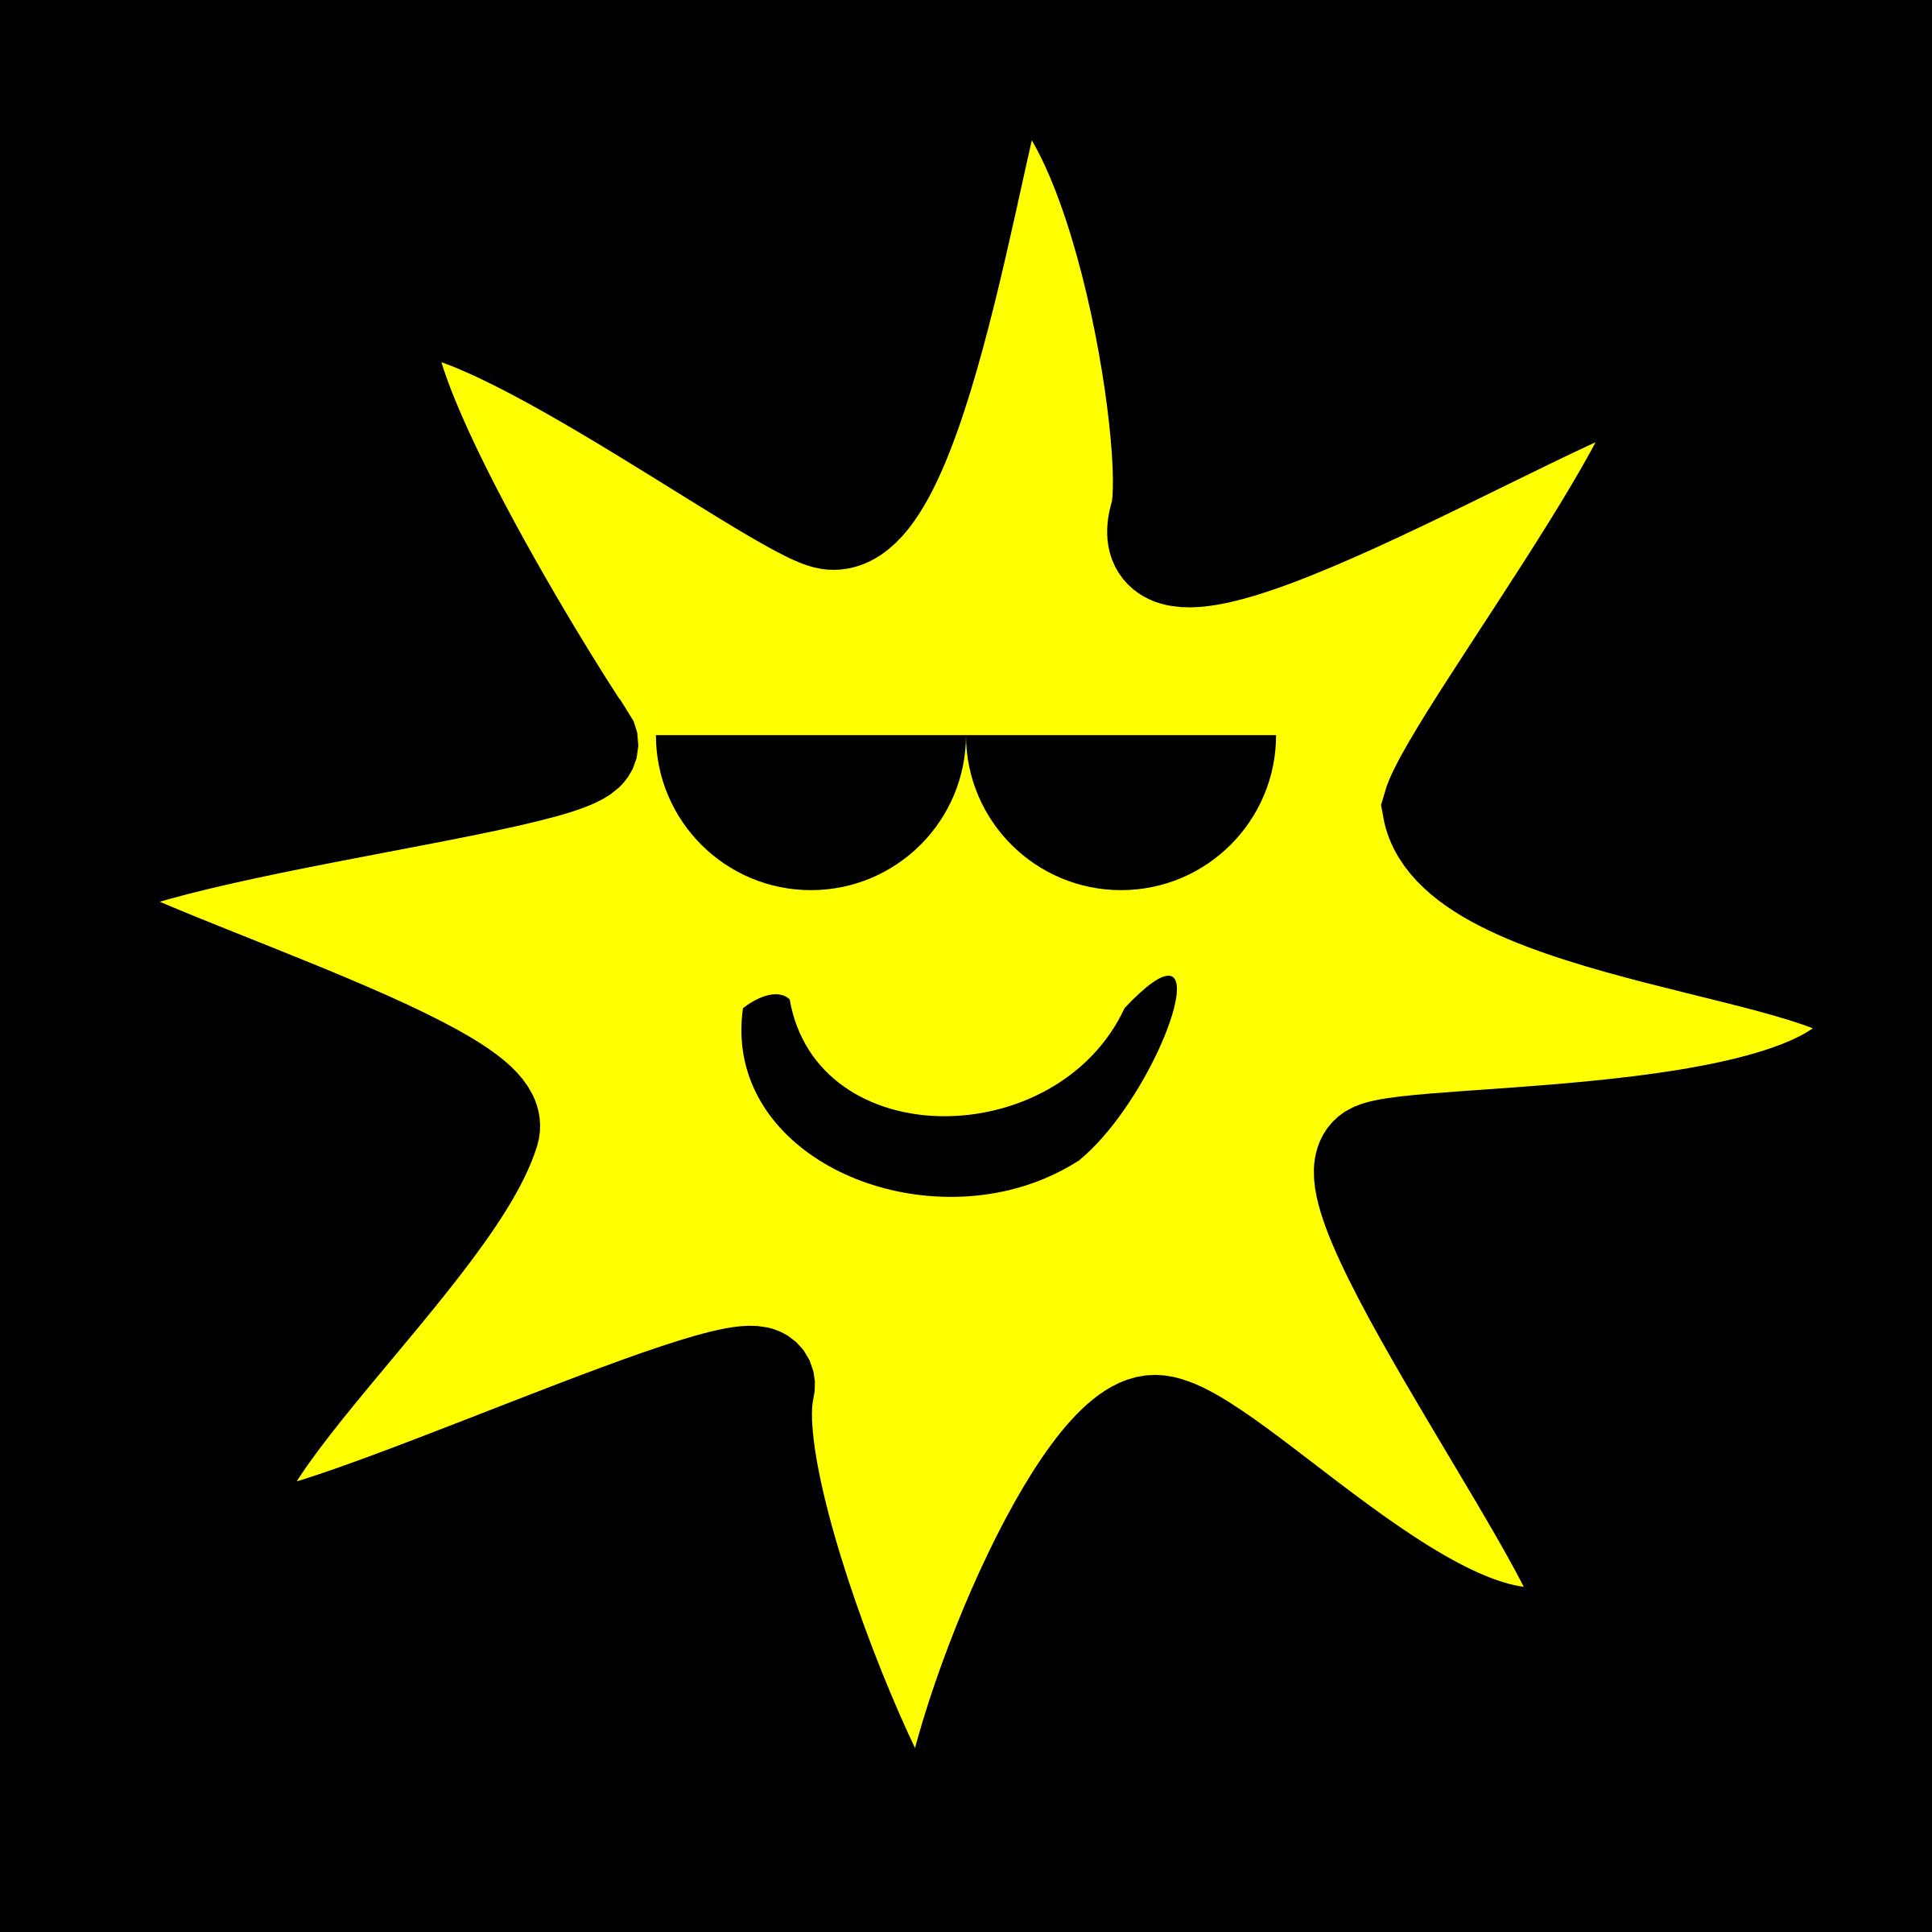 Big image png. Clipart sun happy